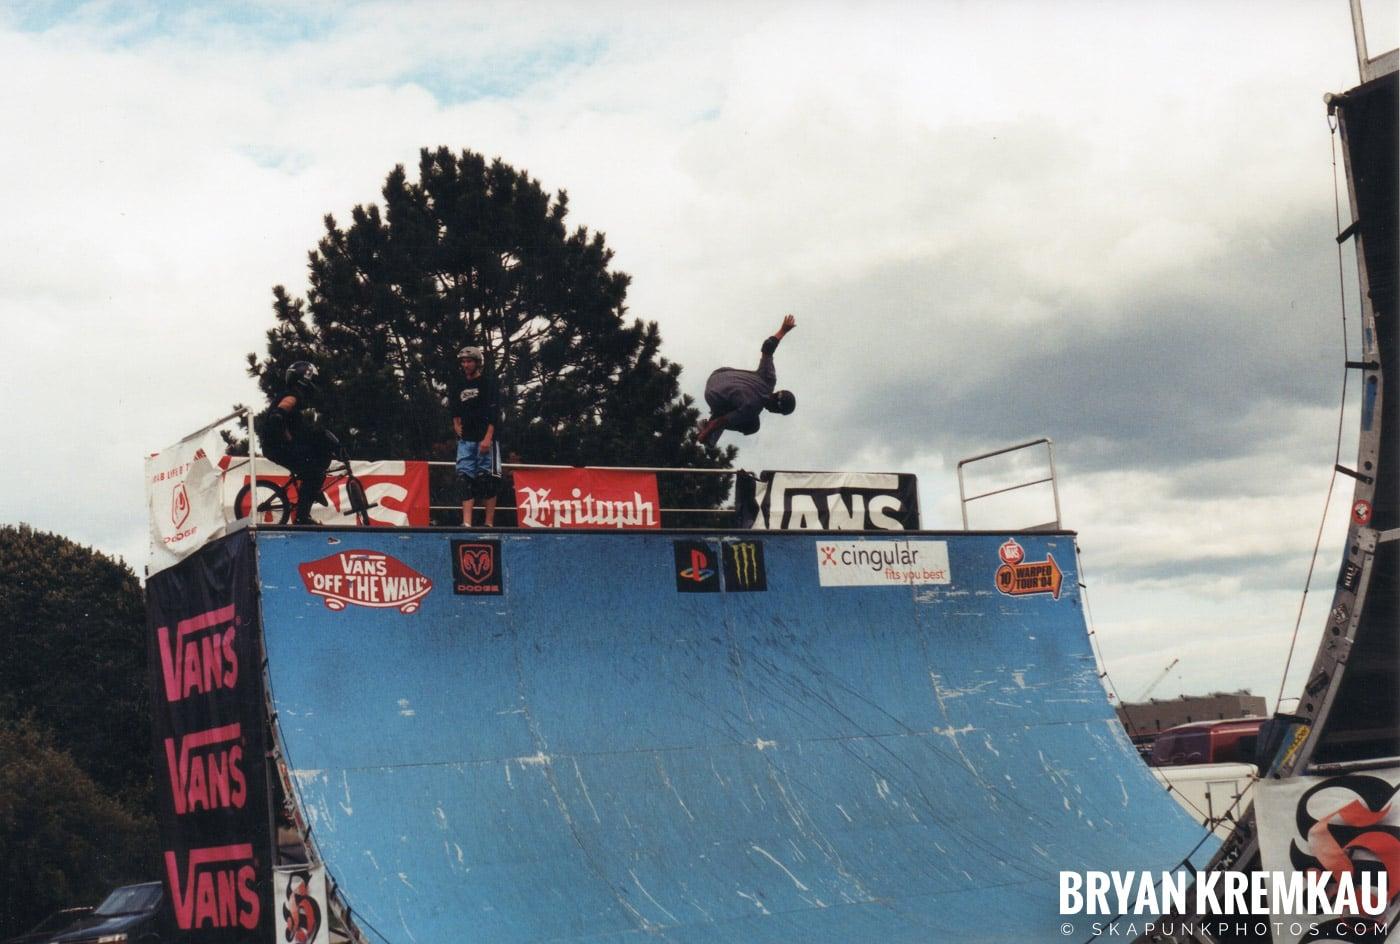 Skaters @ Vans Warped Tour, Randall's Island, NYC - 8.7.04 (5)